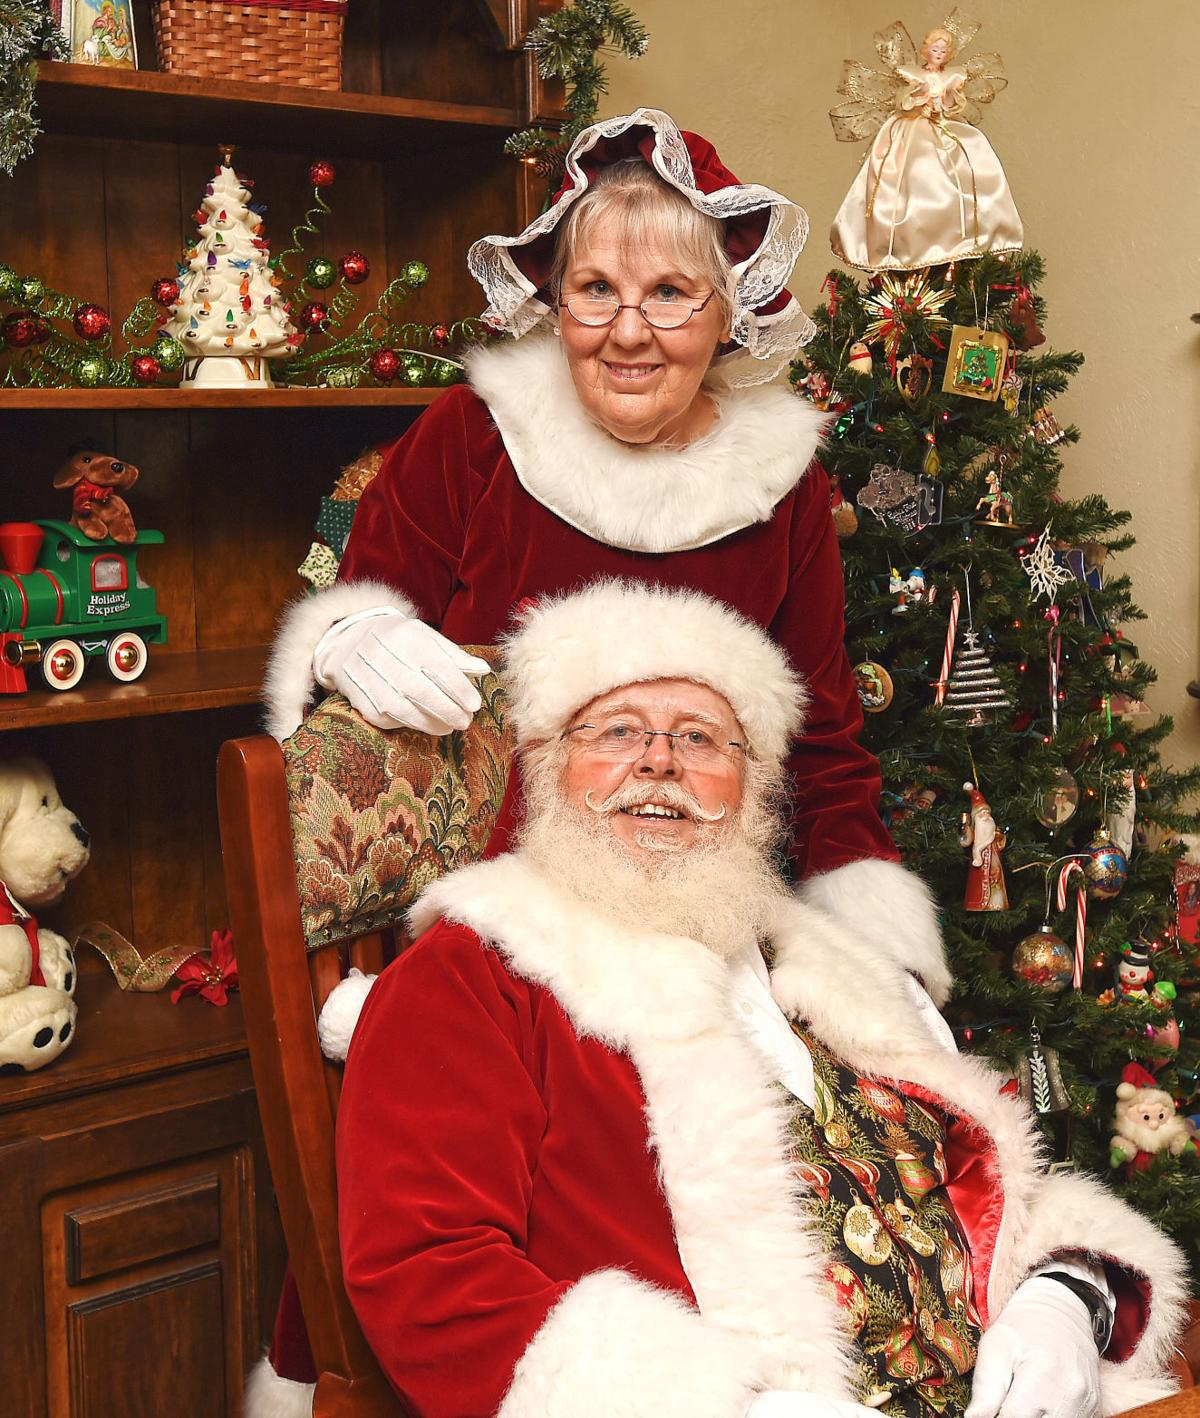 Santa and Mrs. Claus, vertical